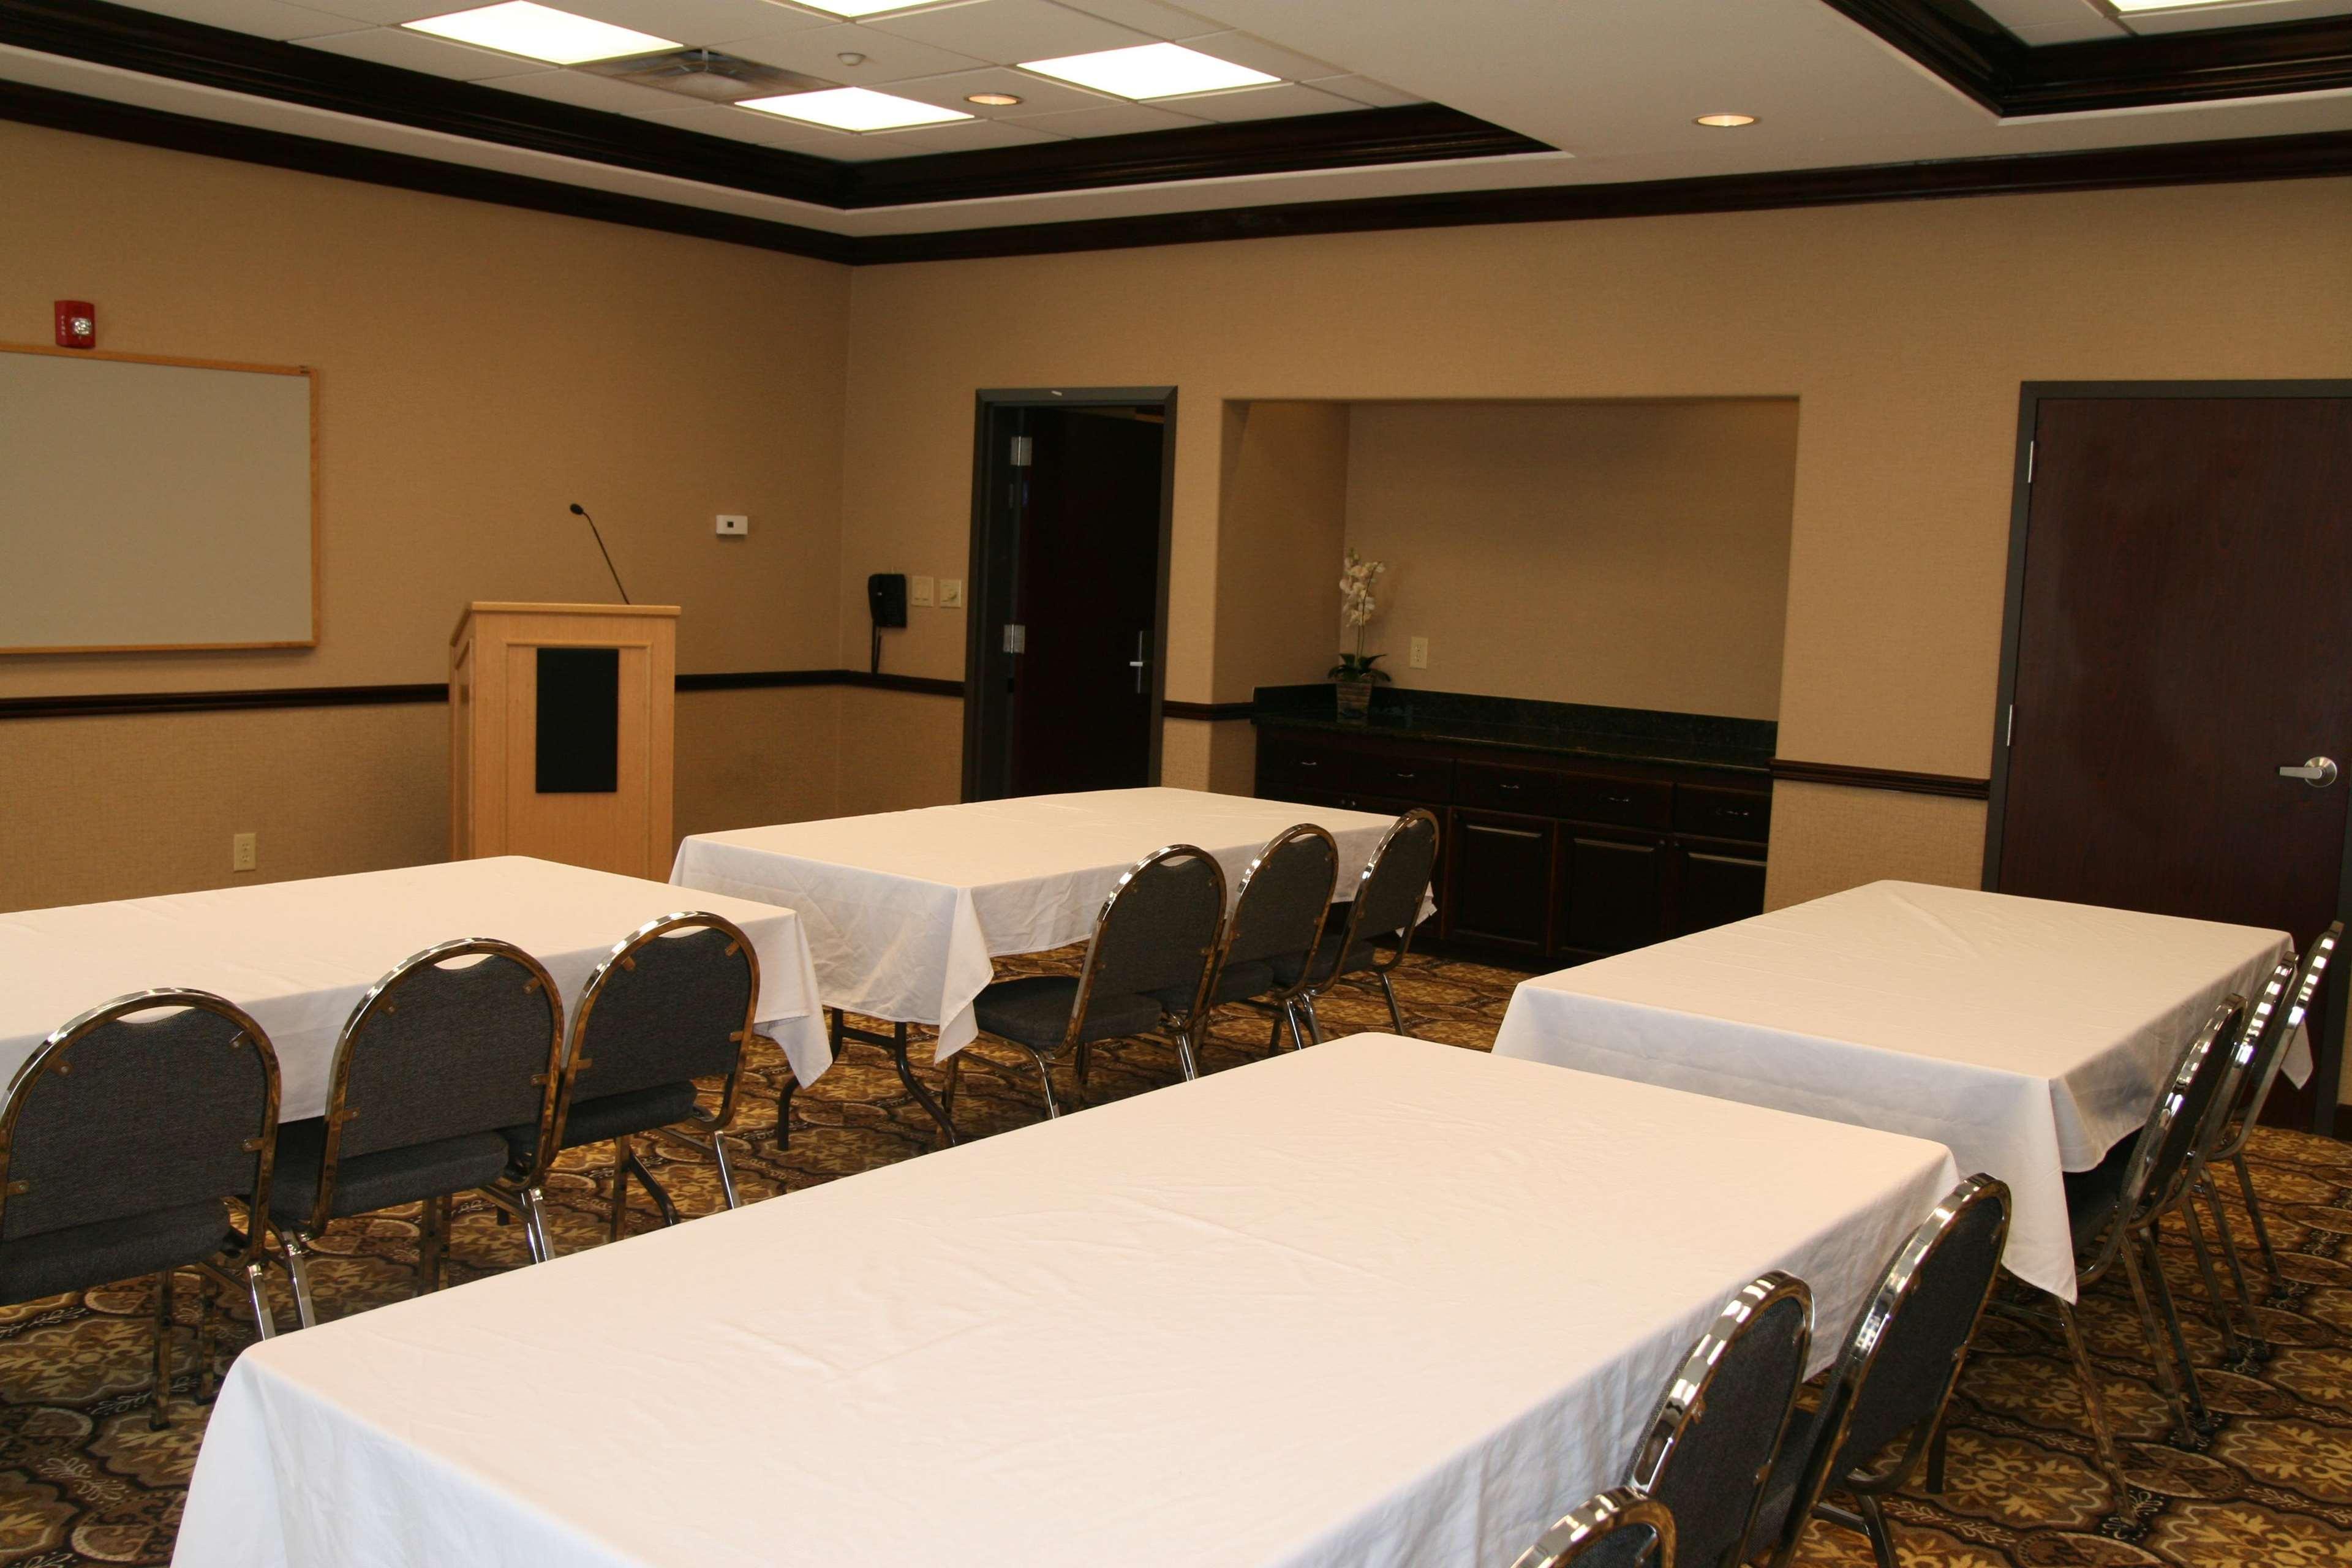 Hampton Inn & Suites Galveston image 31